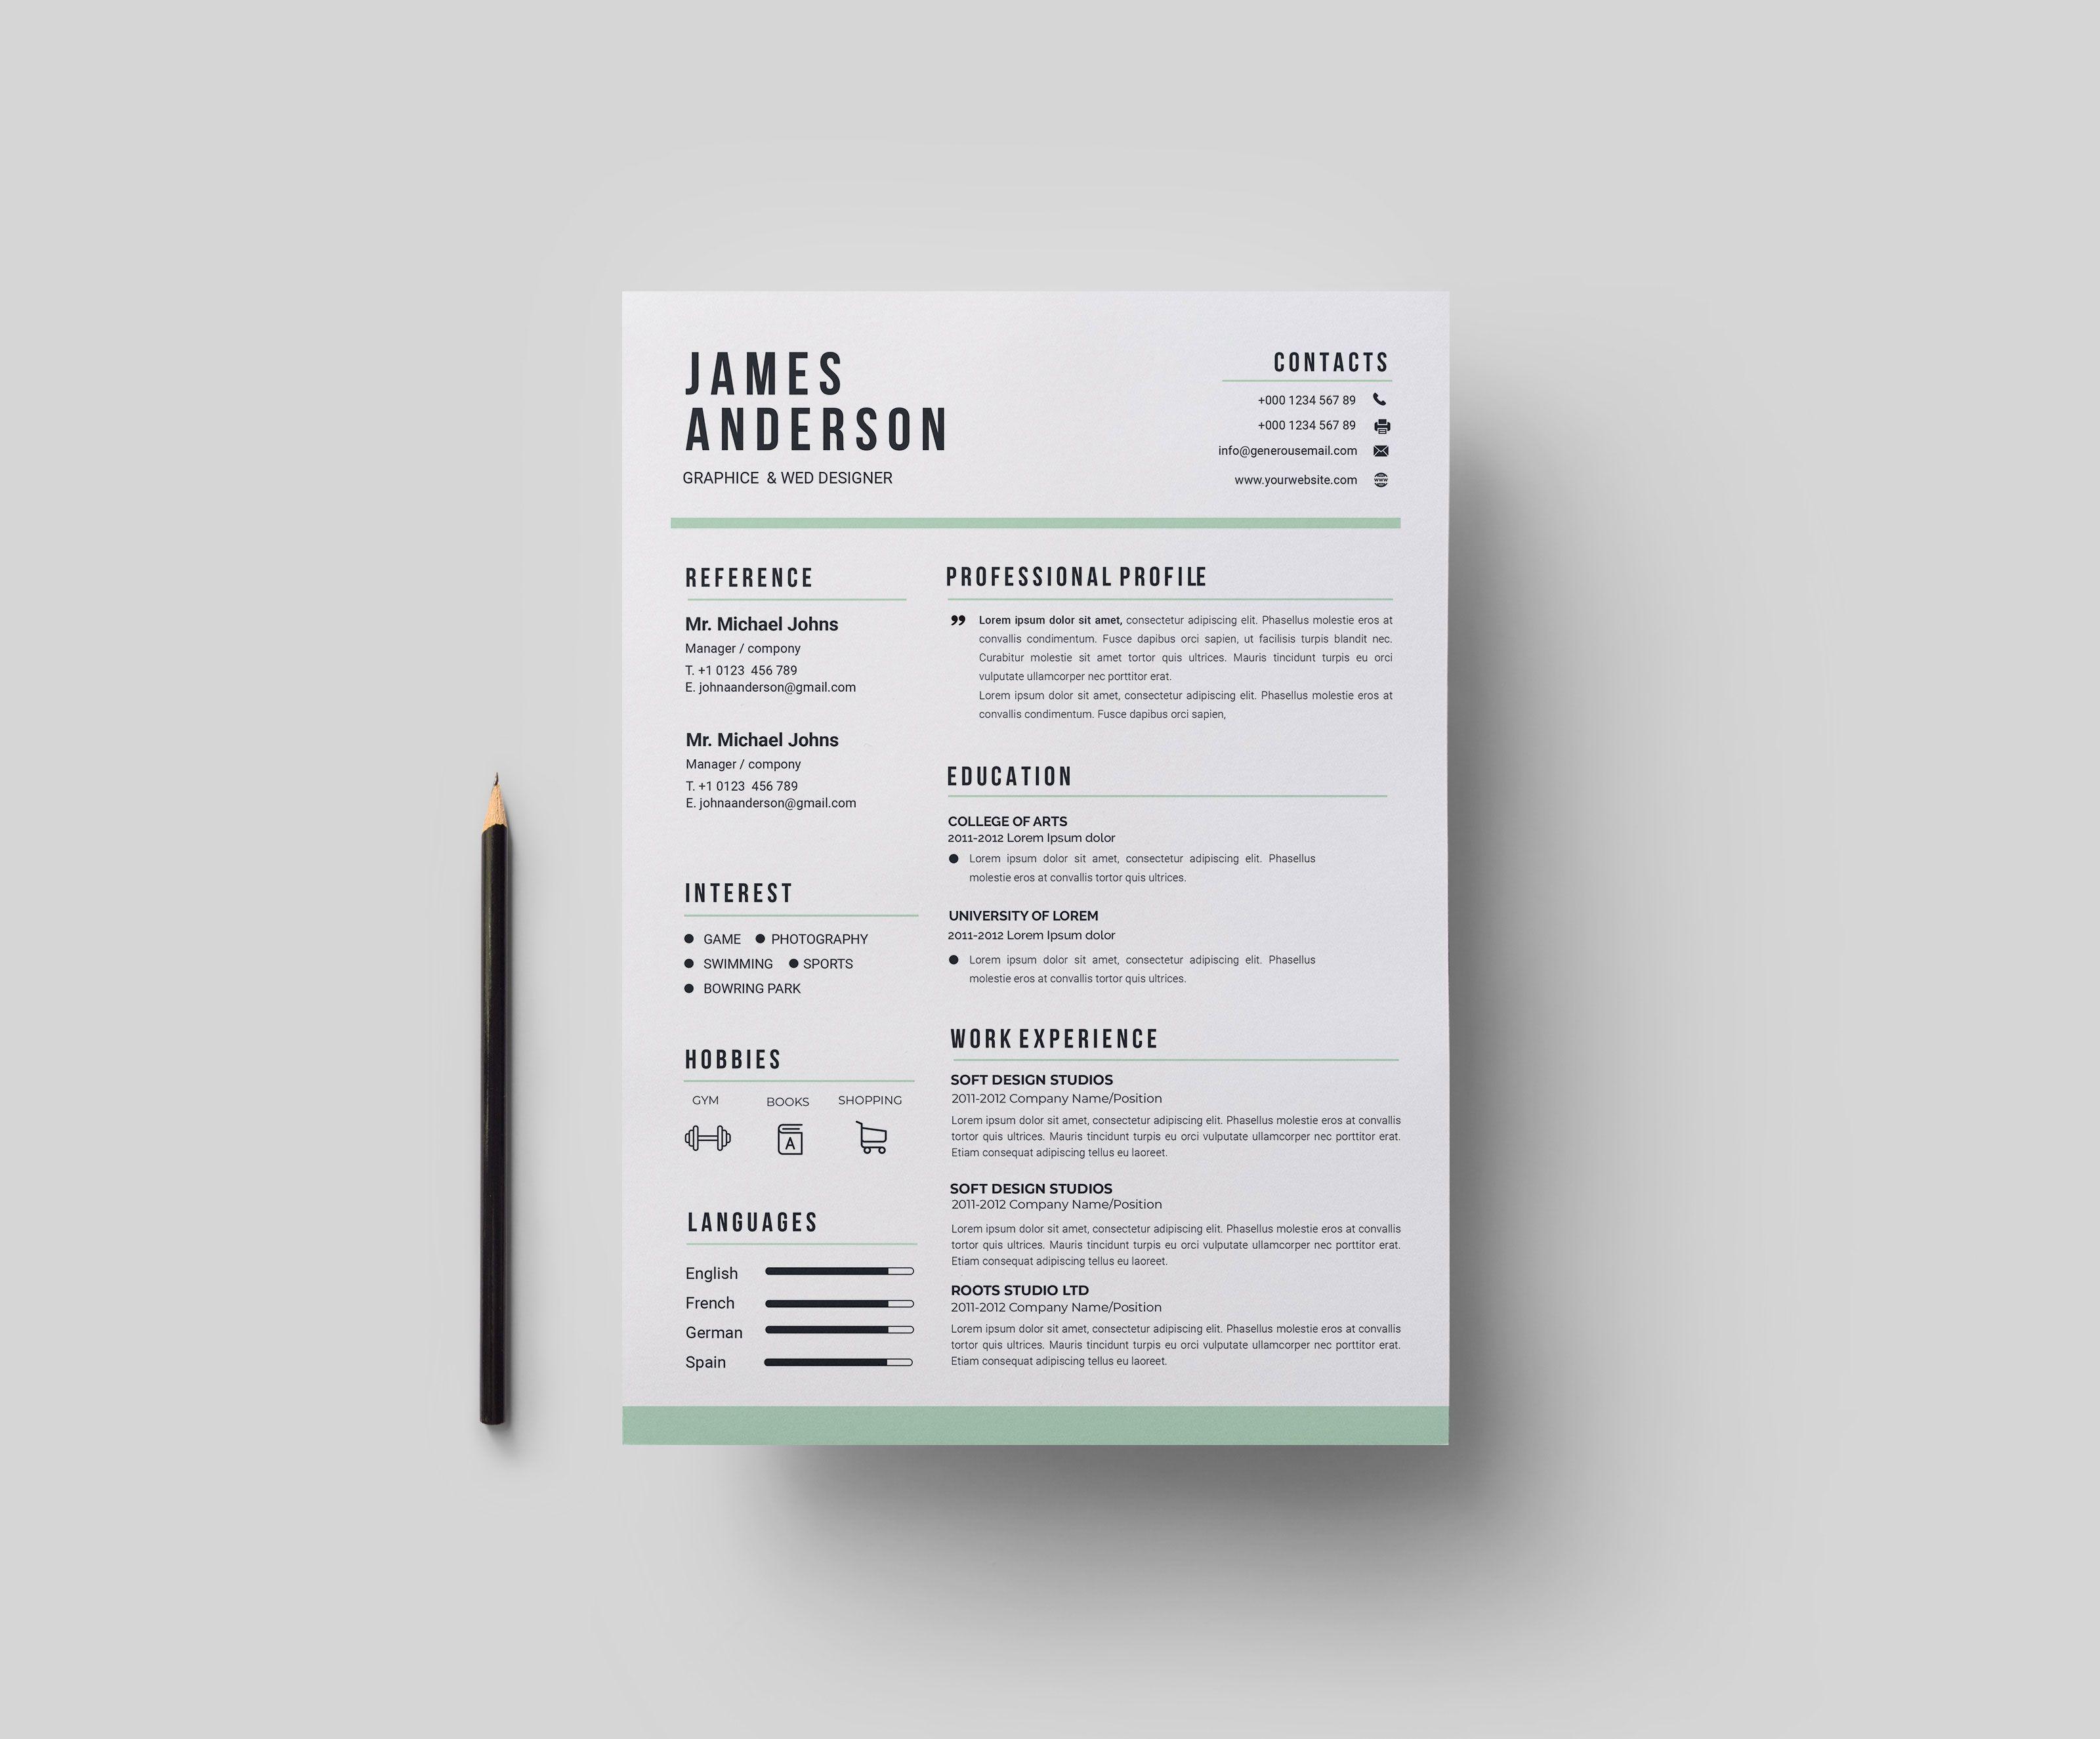 Contemporary Print Resume Templates Graphic Templates Resume Design Template Resume Design Template Free Resume Templates